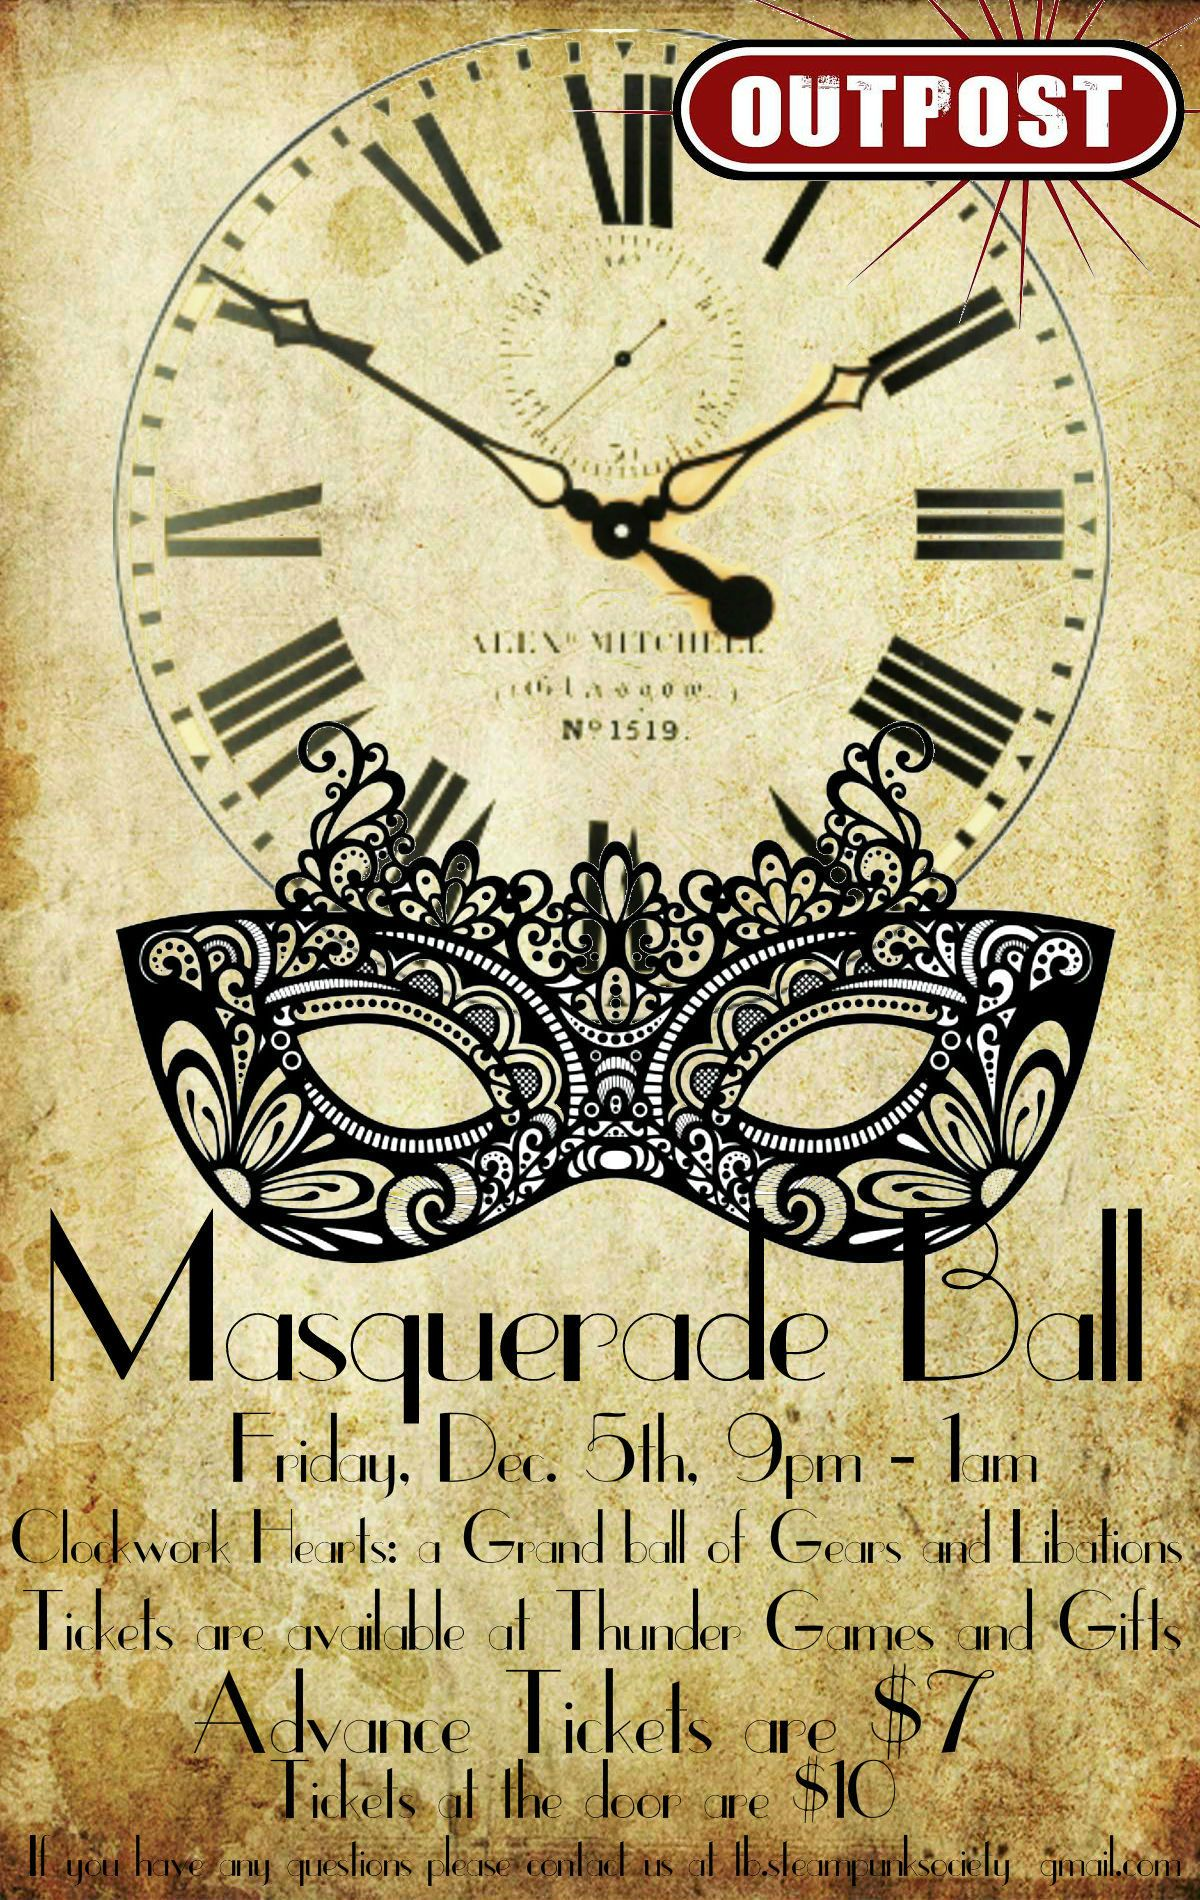 Masquerade Ball Poster OutPost